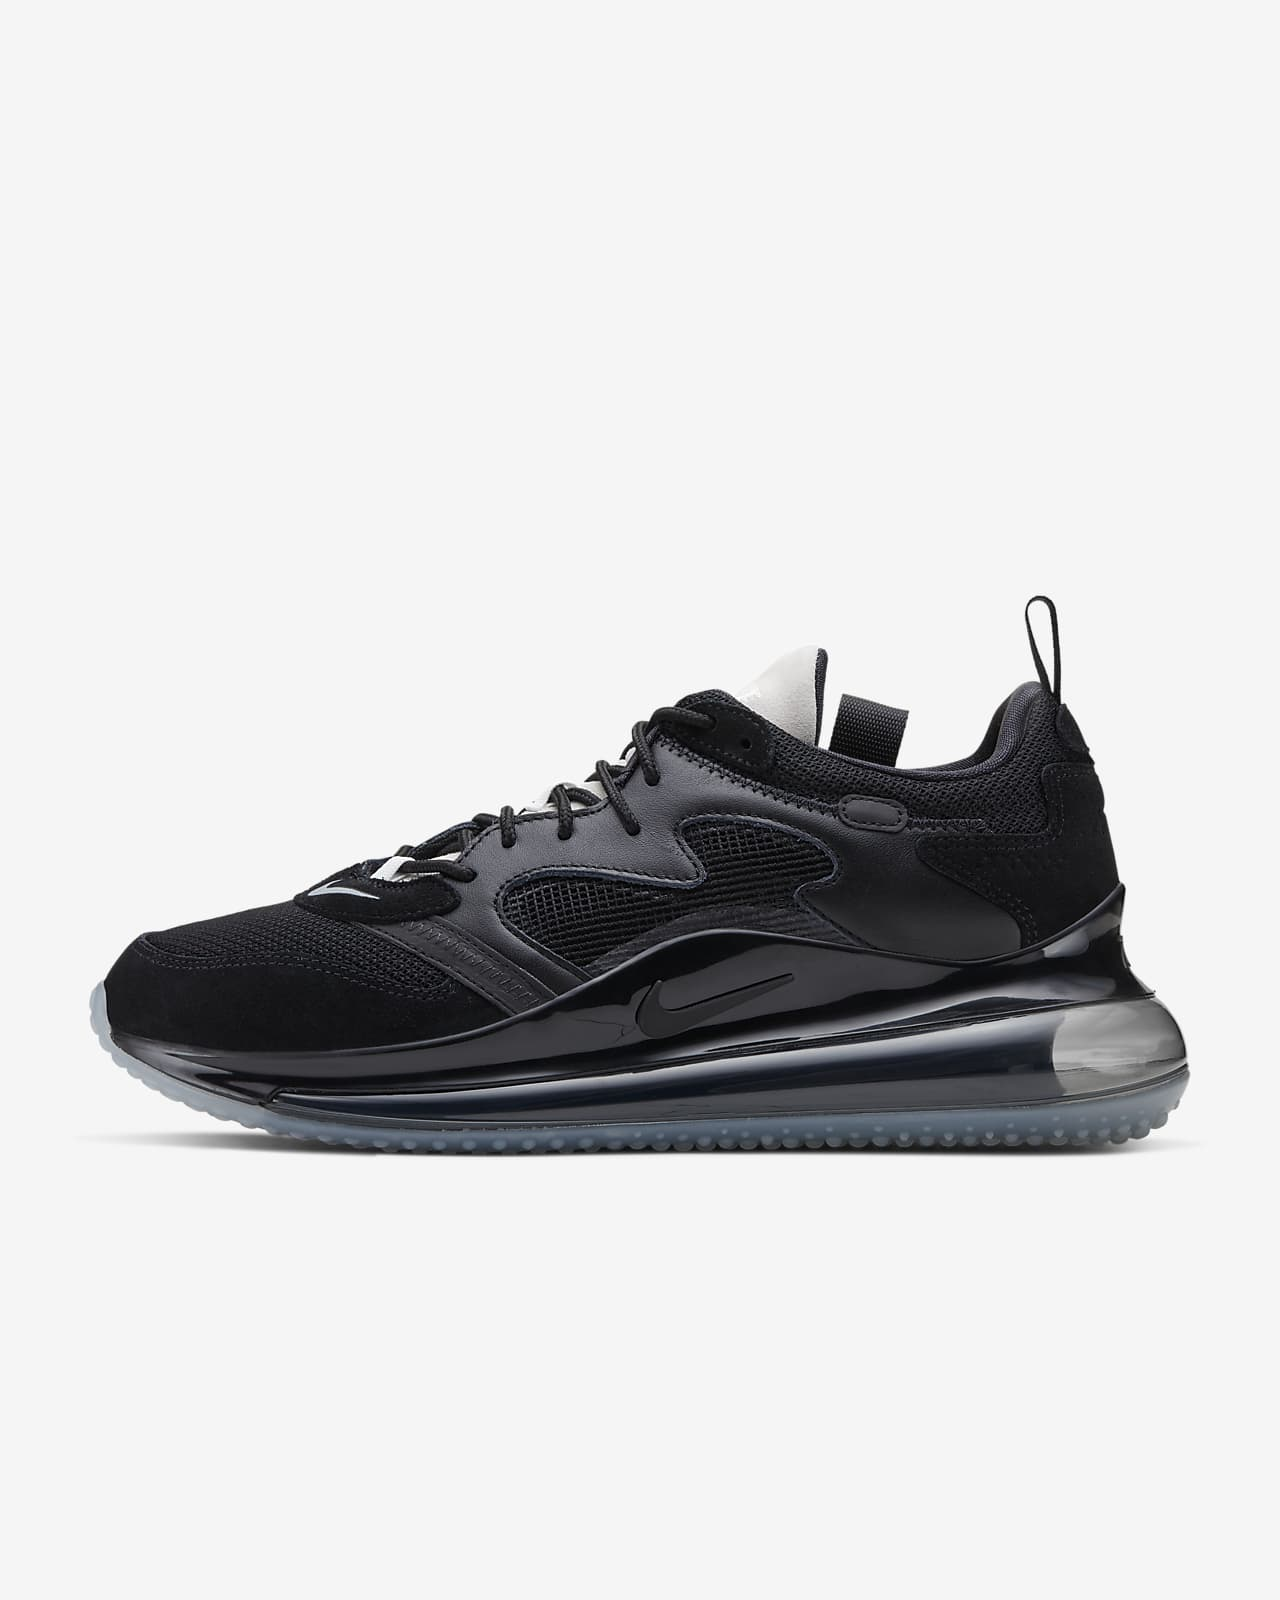 Nike Air Max 720 (OBJ) Men's Shoe. Nike HU